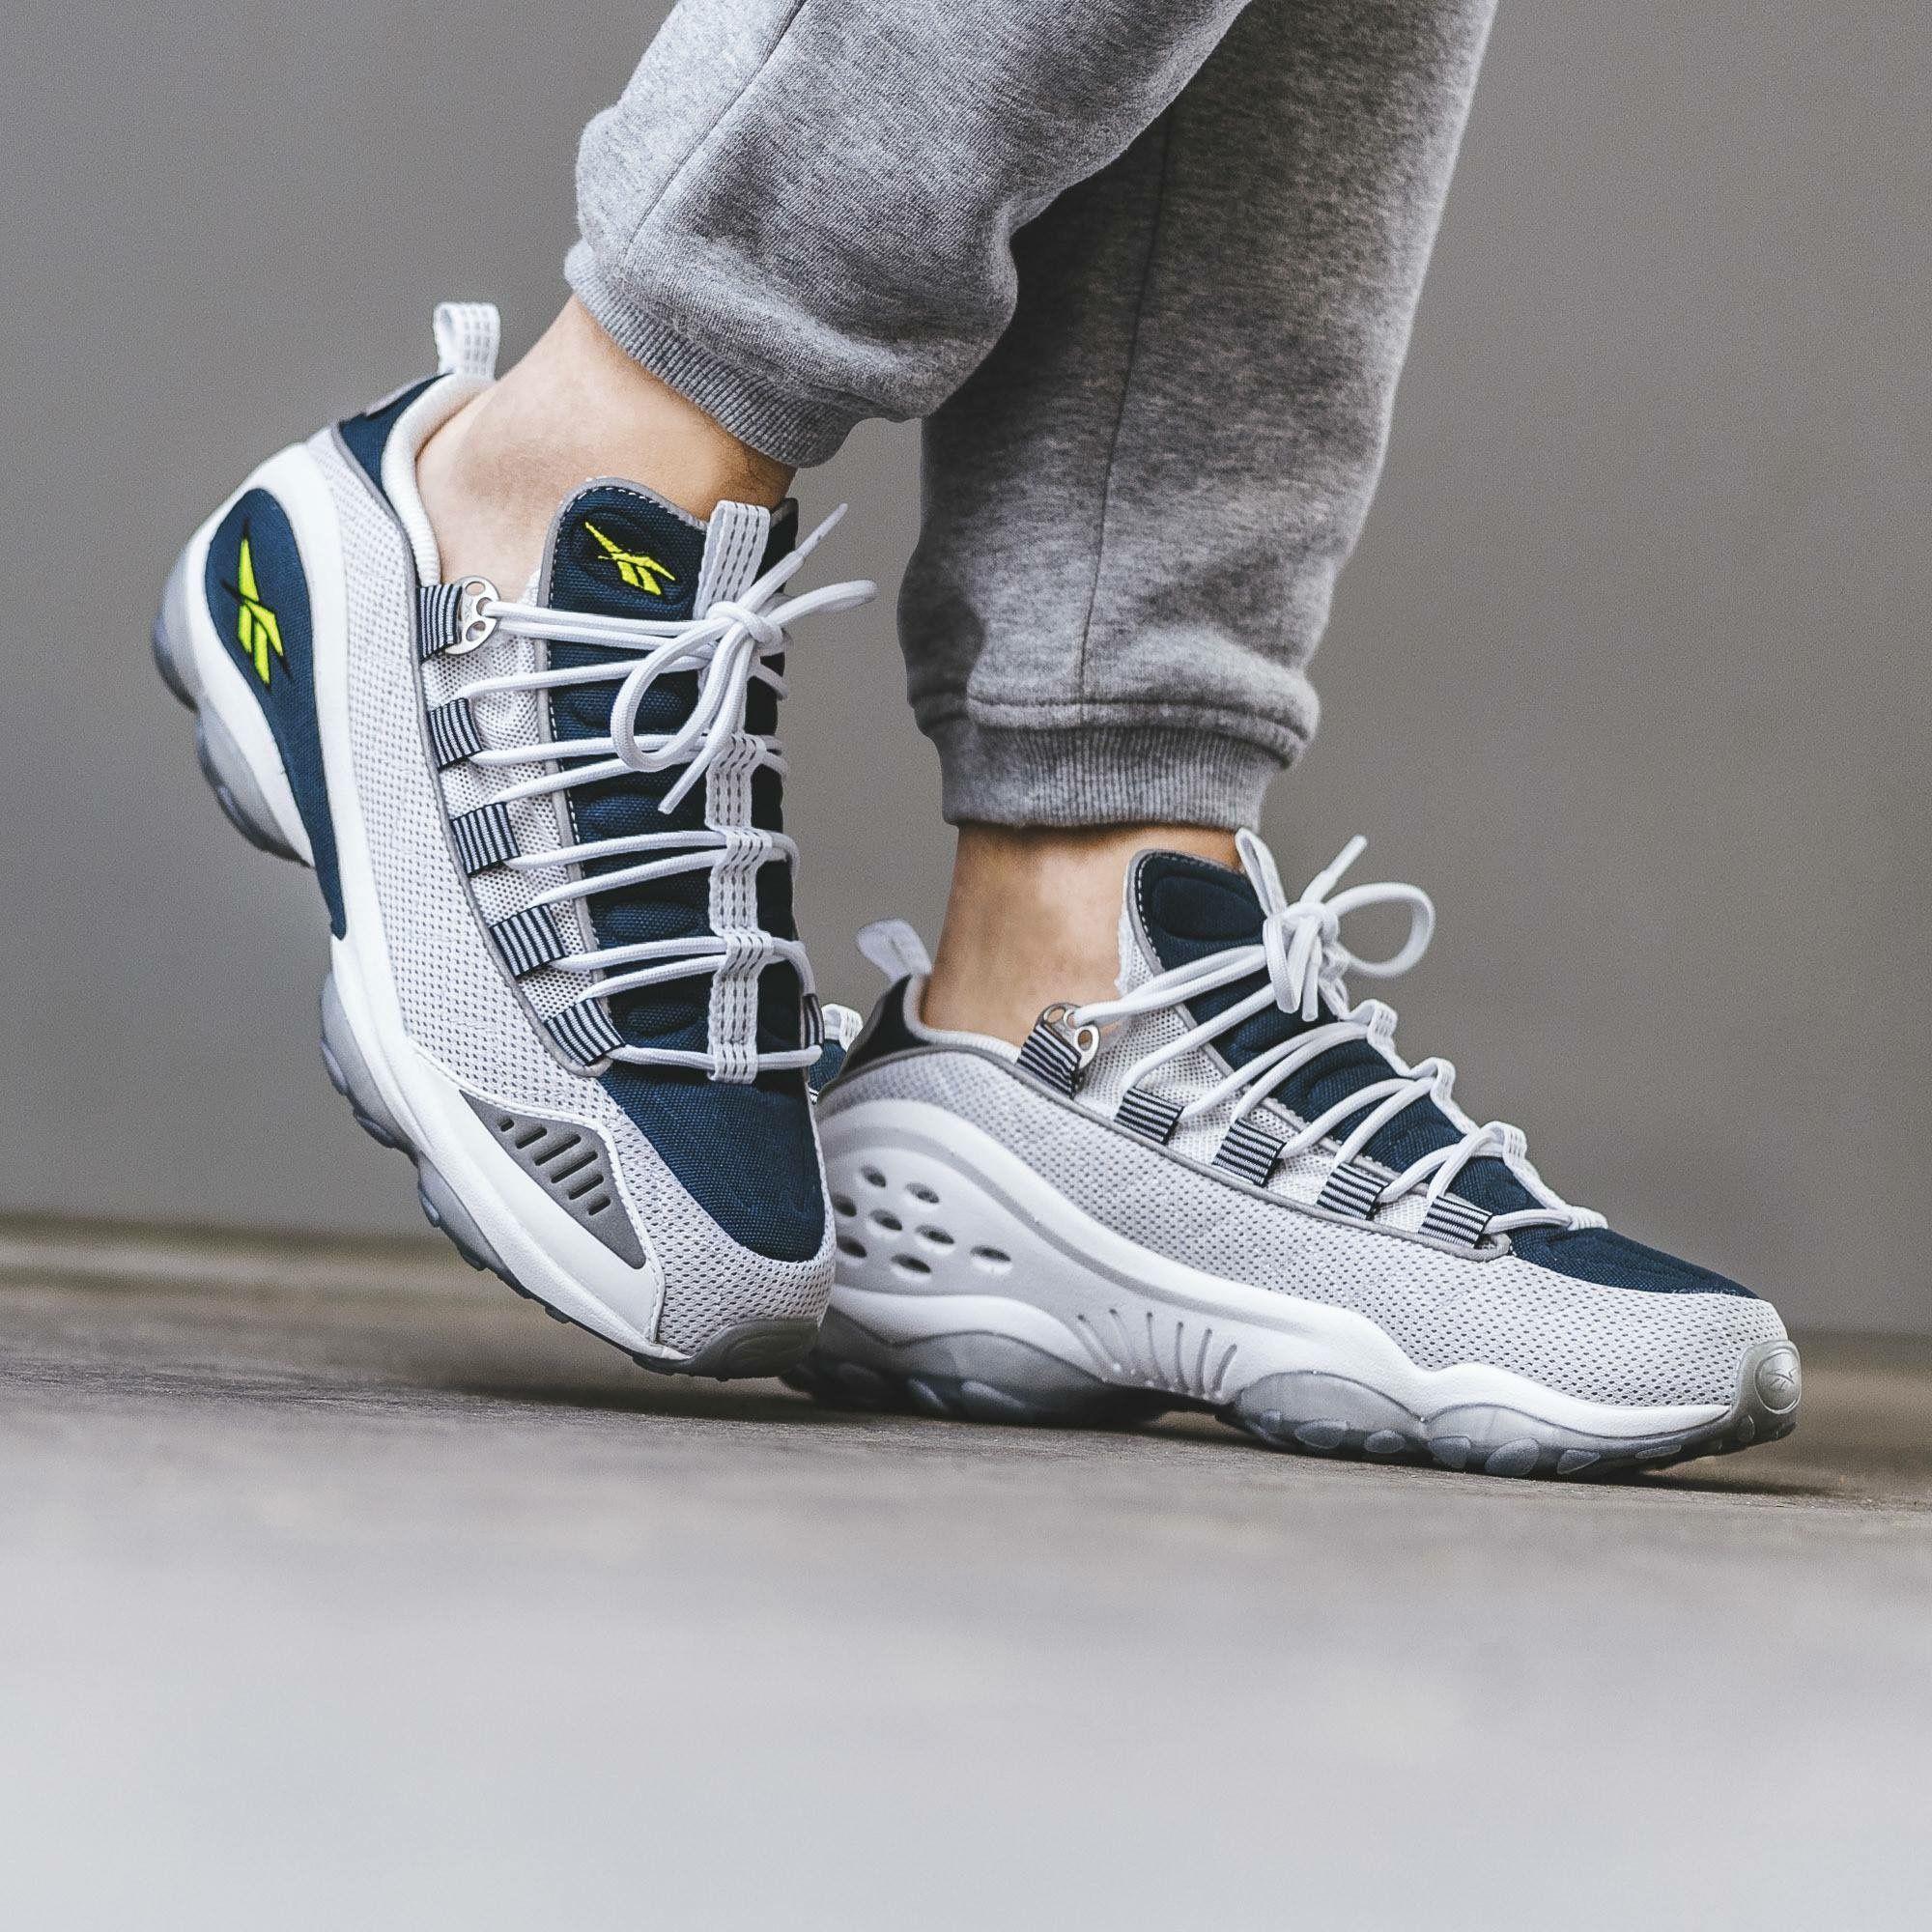 1d1f3079c Reebok DMX 10 Run | one day | Sneakers, Reebok, Shoes